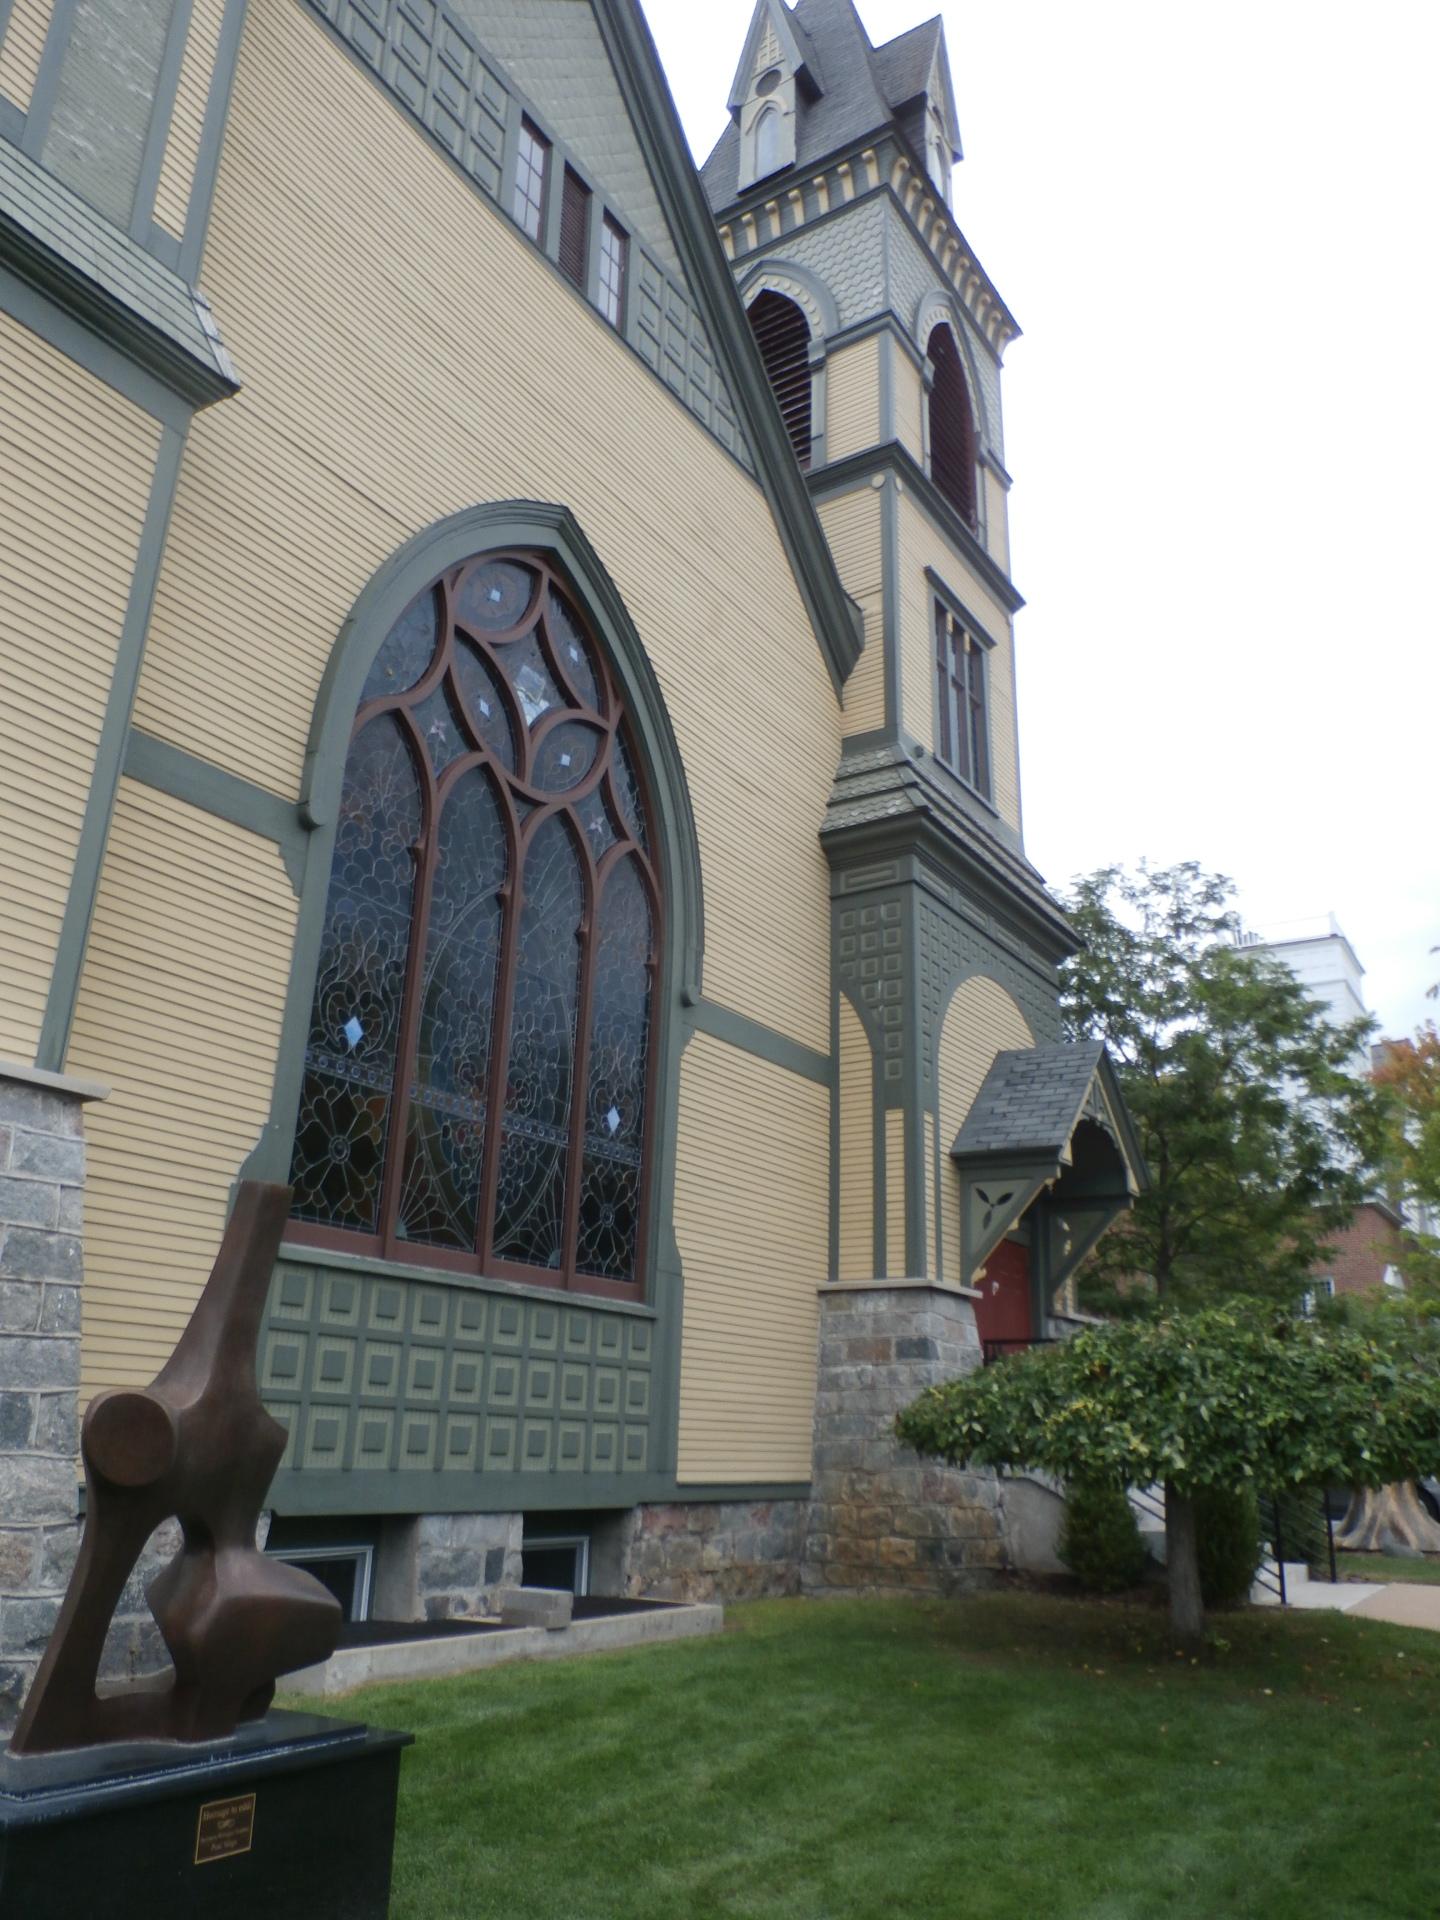 The Crooked Tree Arts Center